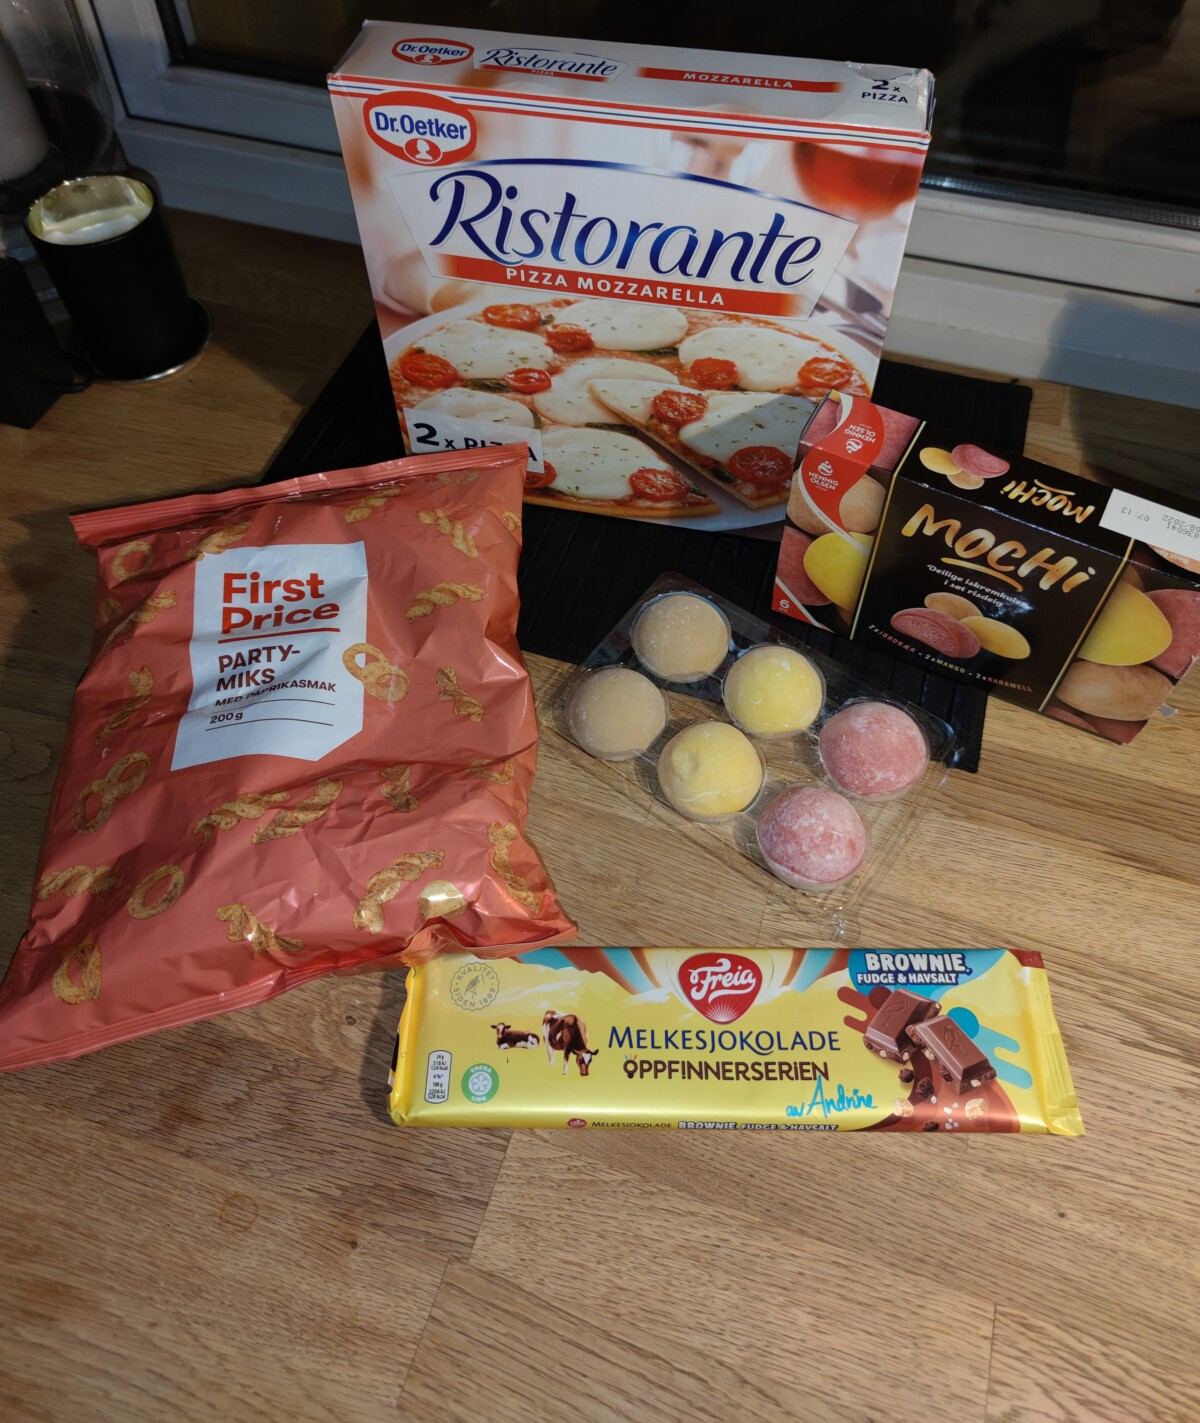 mathandel-mattinnkjøp-innkjøp-mat-middag-dessert-is-blogg-blogger-toppblogger-topplisten-topplista-handel-shopping-isalicious1-isalicious-isalicious.blogg.no-kiwi-påfyllavmat-helgehandel-mochi